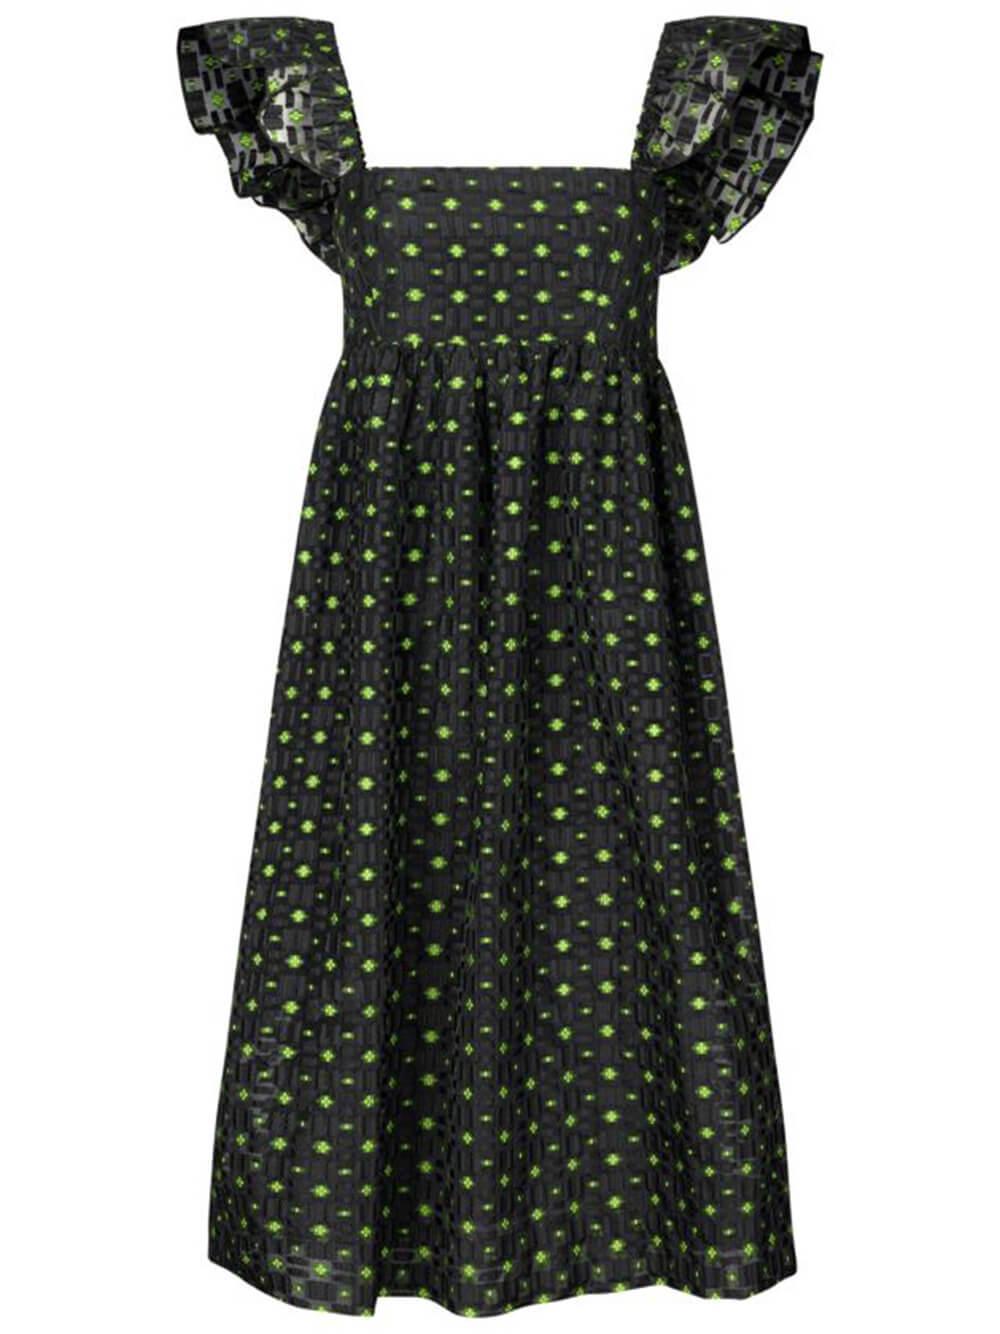 Ashaki Midi Dress Item # 21738